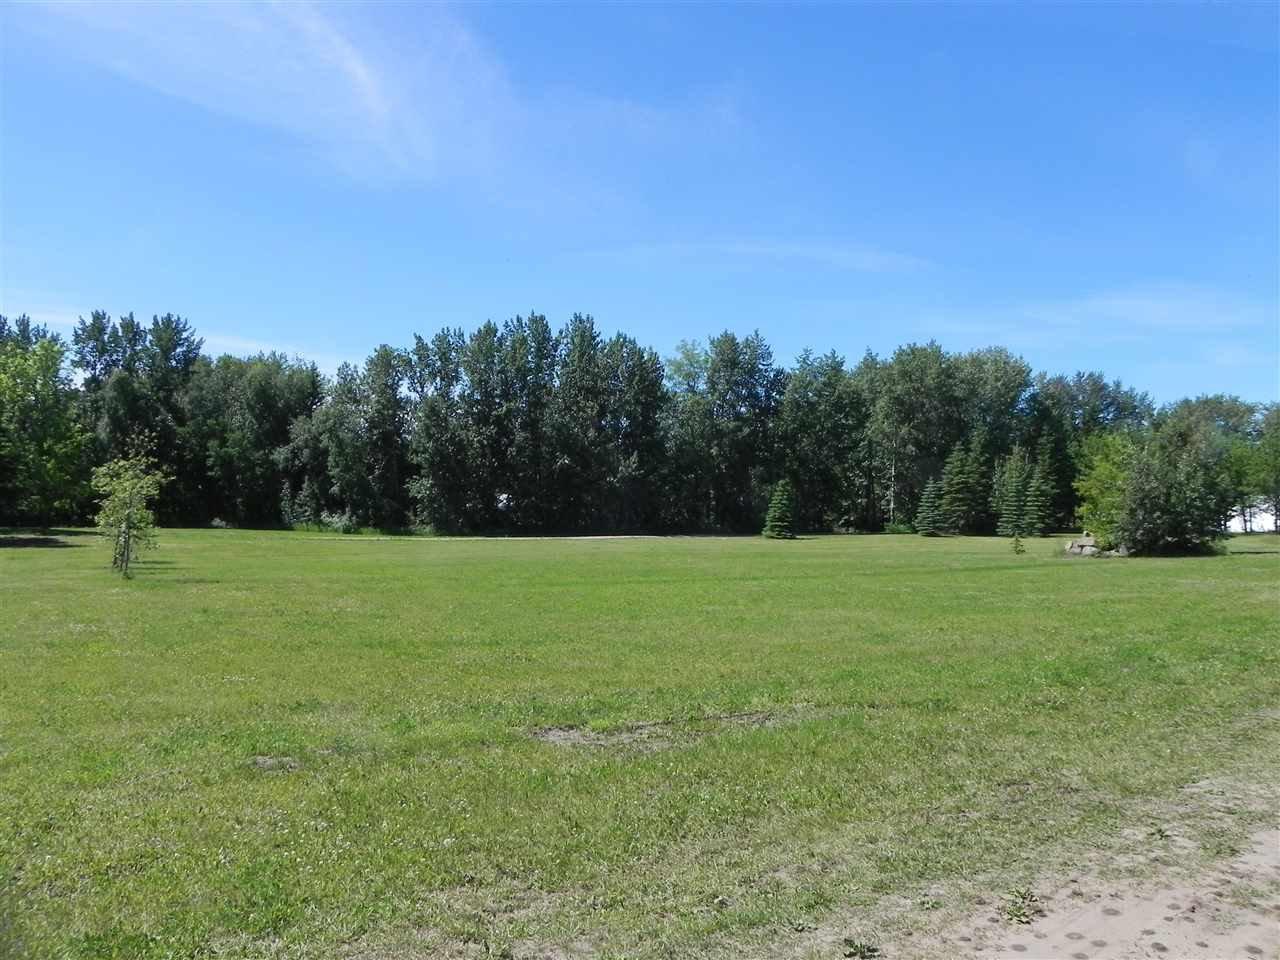 Main Photo: 43 Willowridge Estates: Rural Parkland County Rural Land/Vacant Lot for sale : MLS®# E4200228